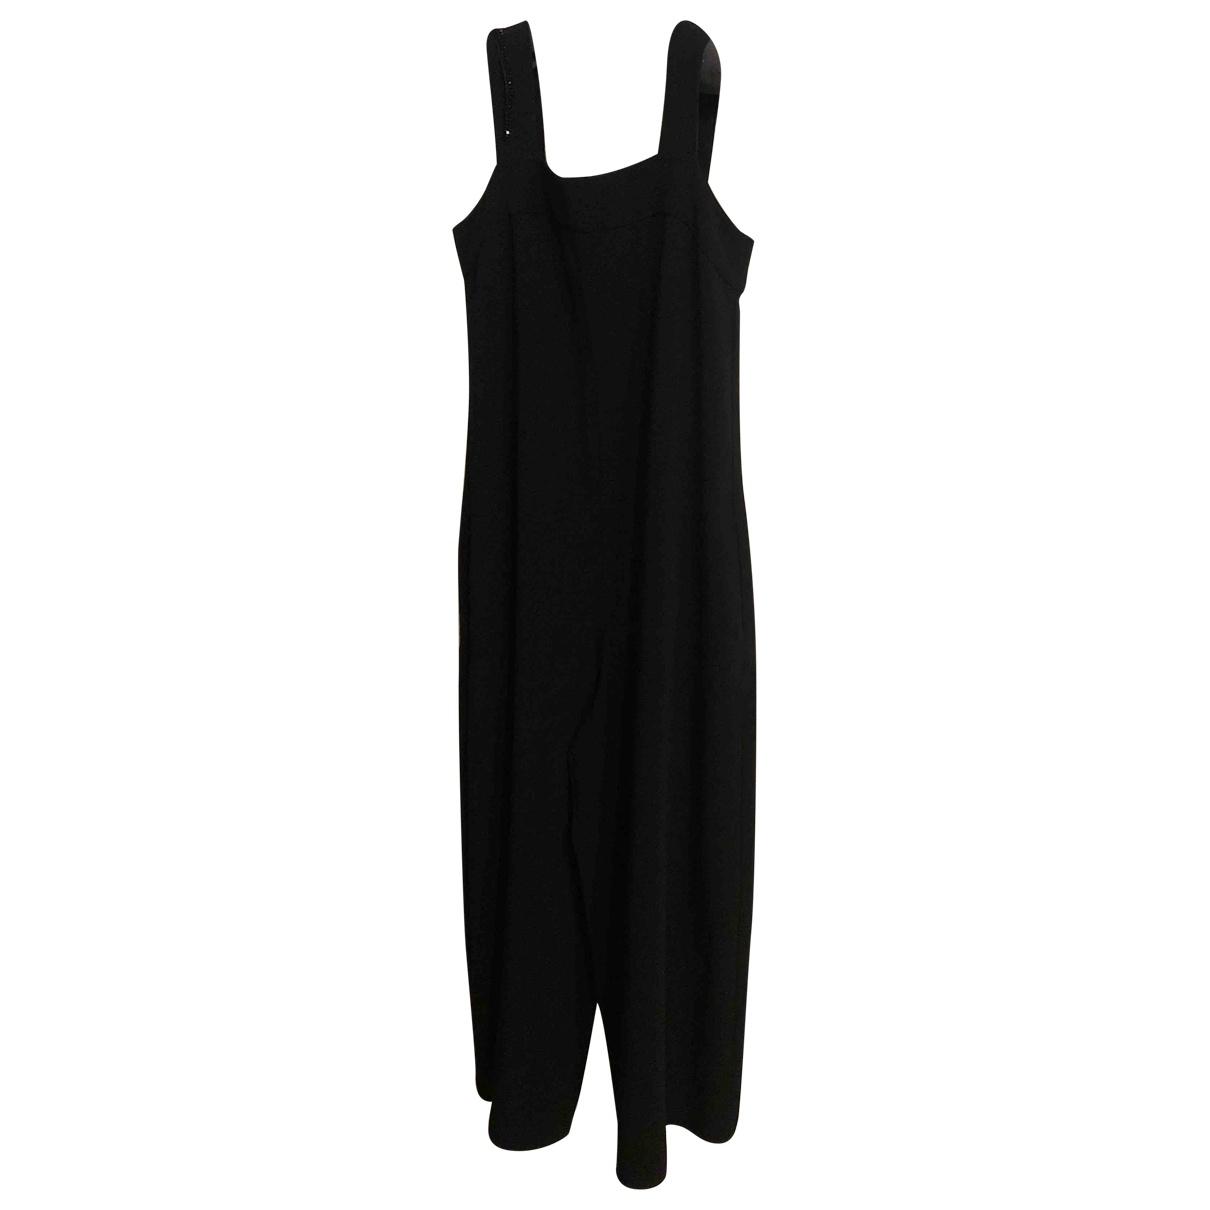 Max Mara 's \N Black jumpsuit for Women 46 IT